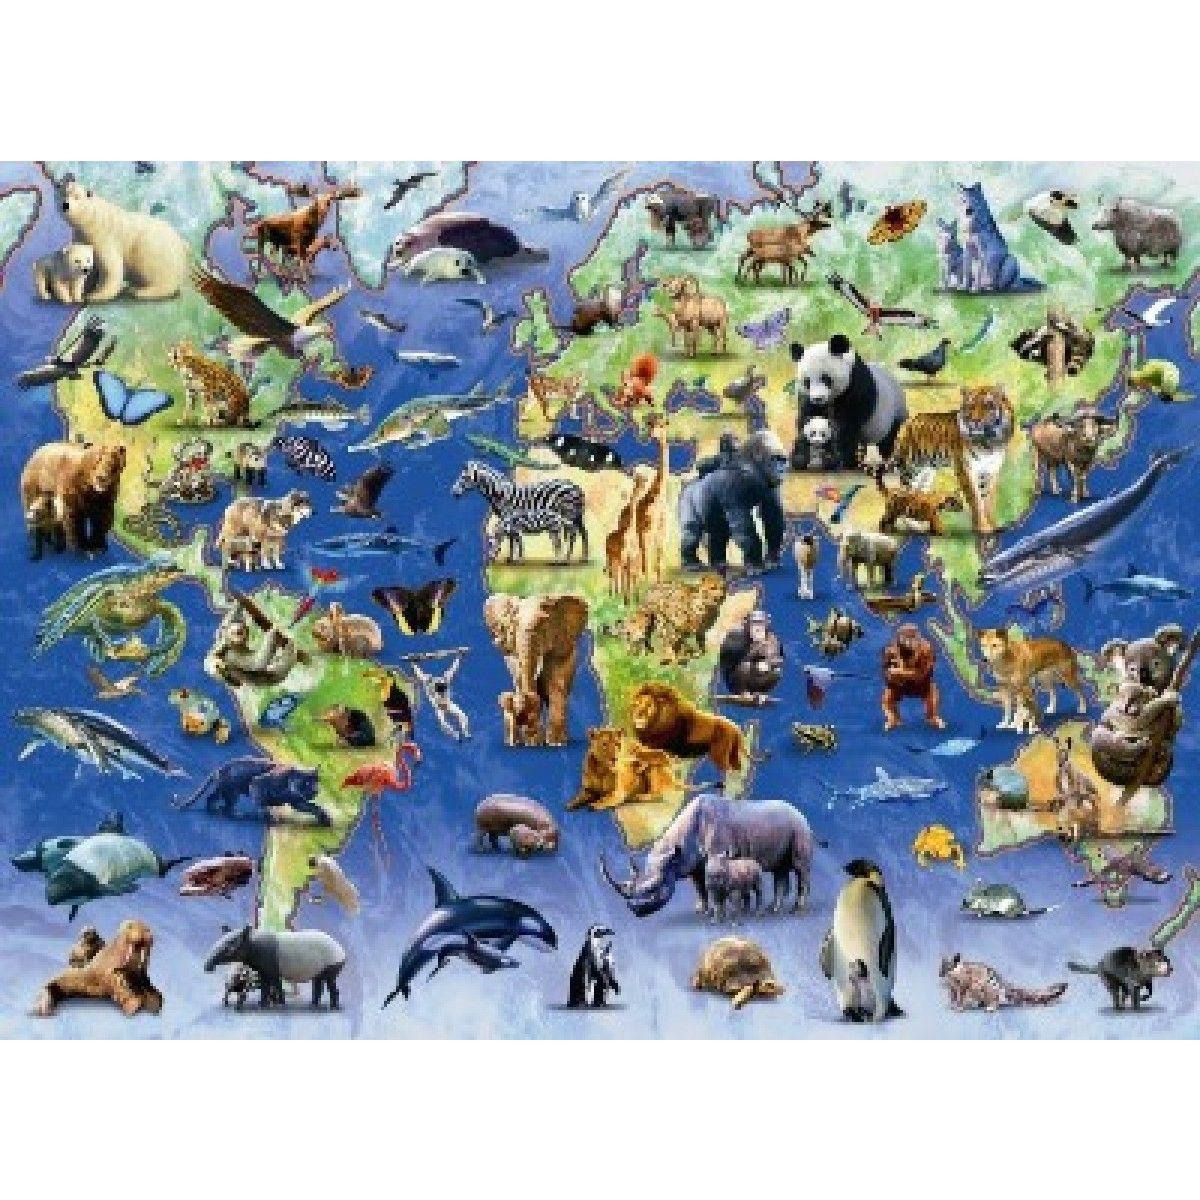 Bedreigde Diersoorten Google Zoeken Dieren Wilde Dieren Dierentuin